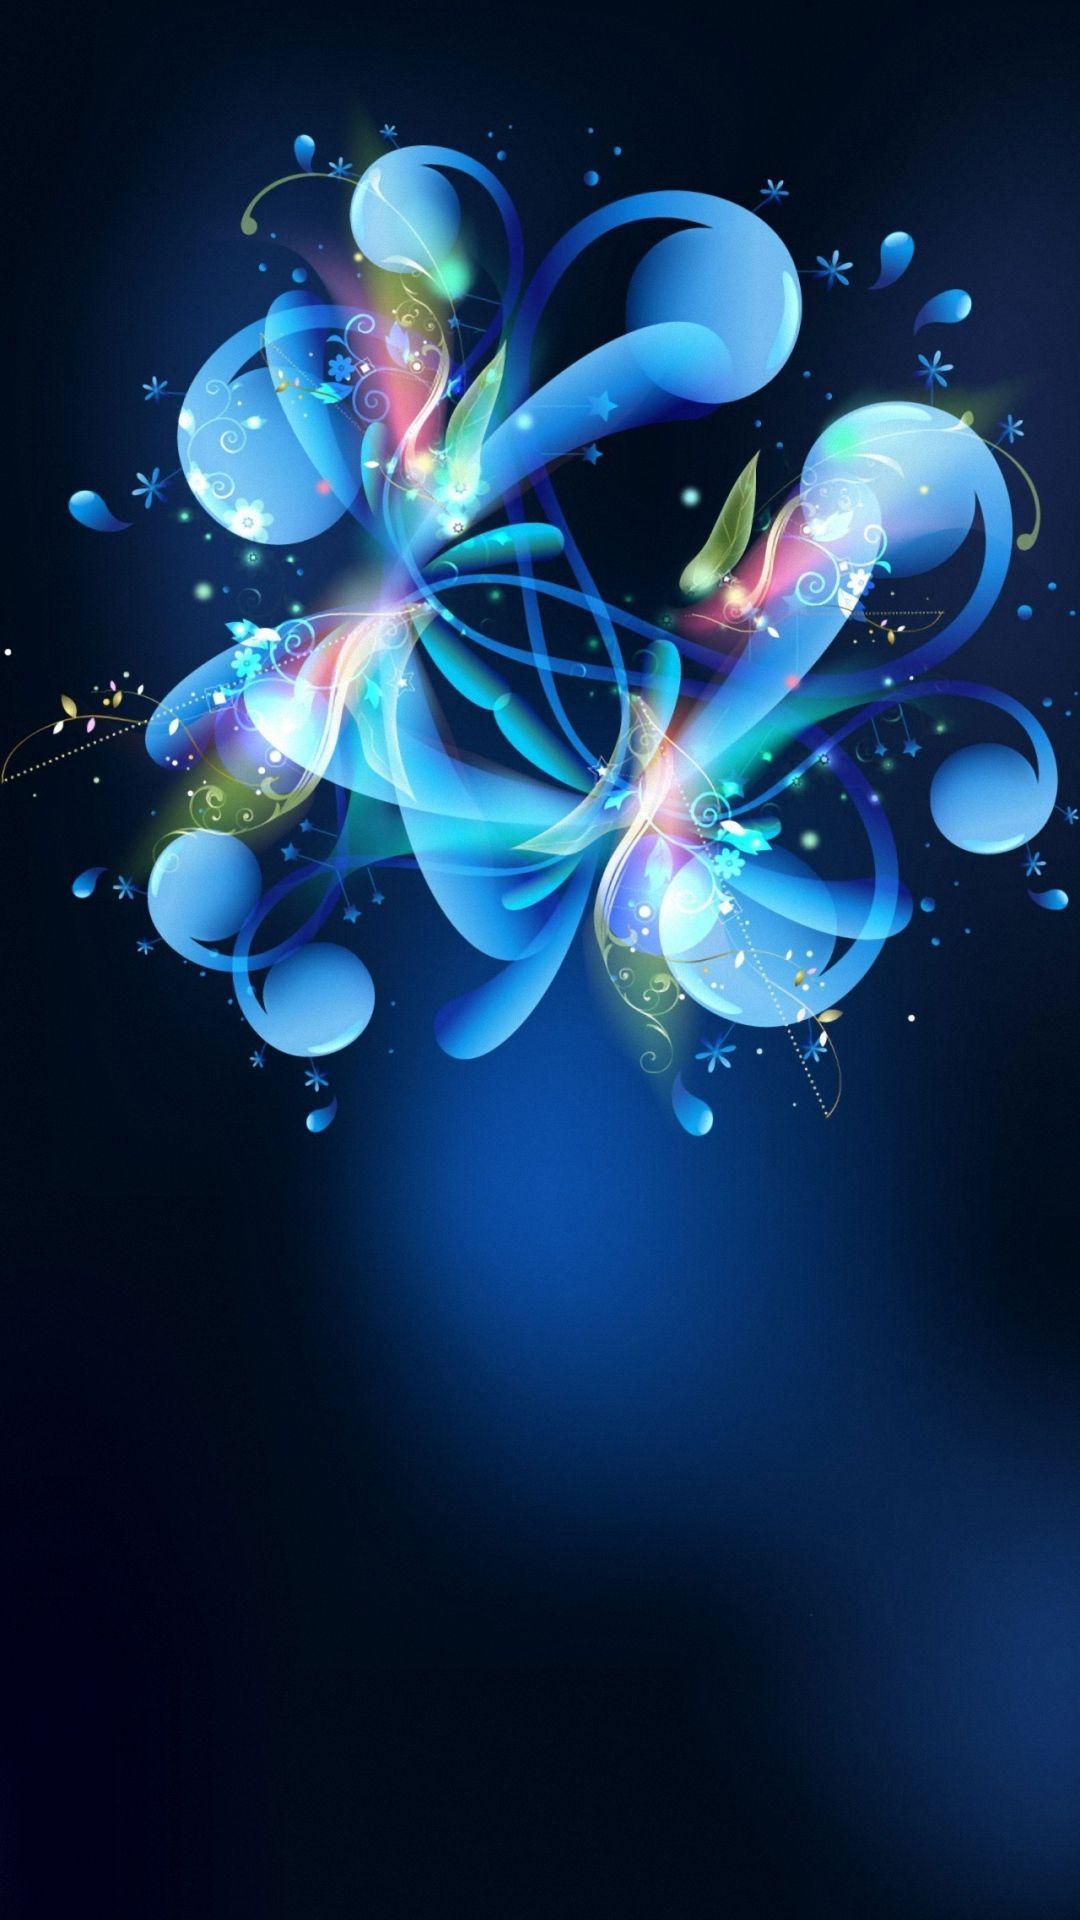 Blue Flower Wallpaper For Iphone